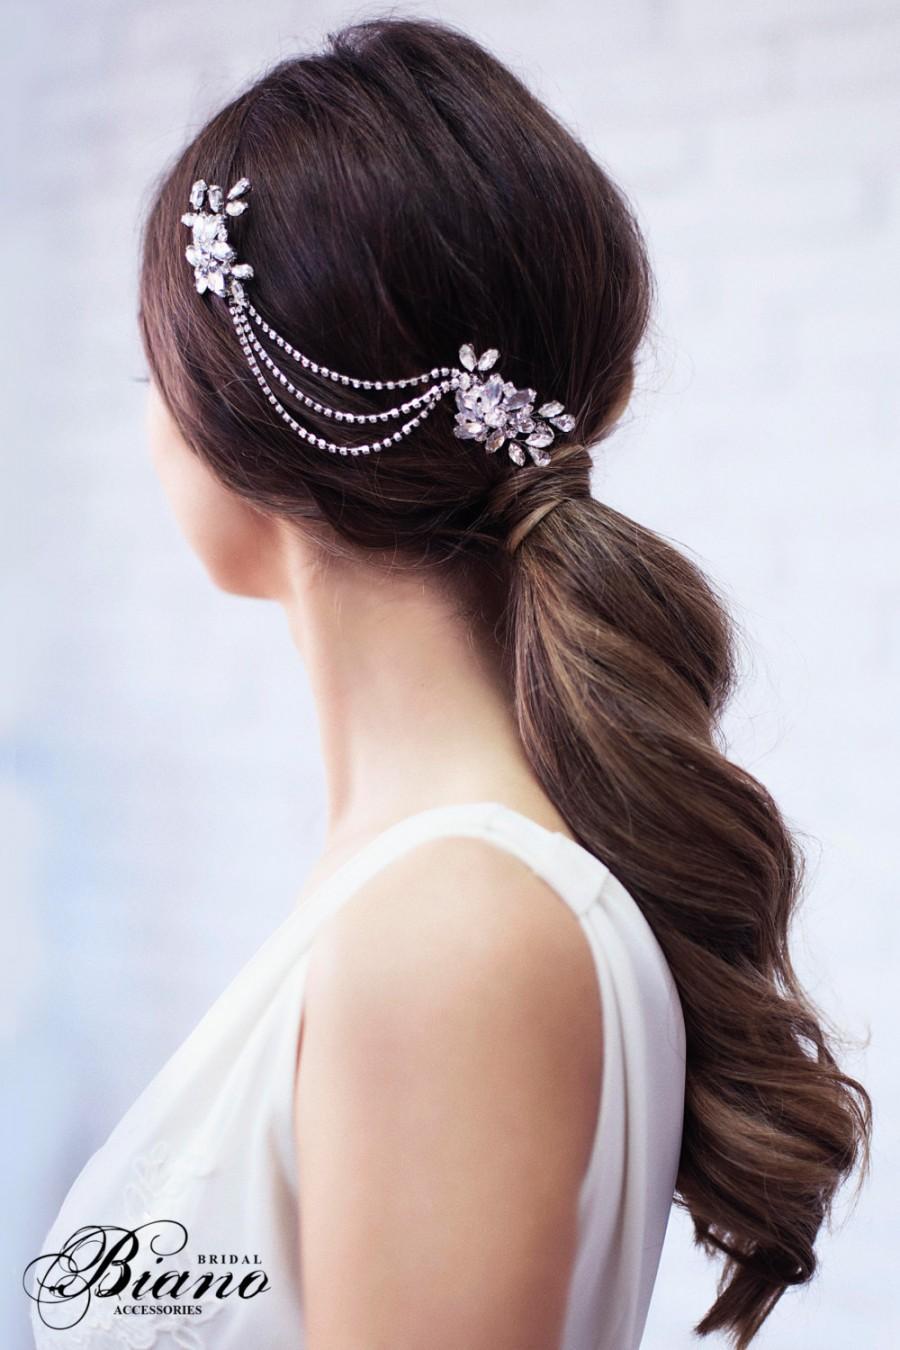 زفاف - SALE- Bridal Headpiece, Bridal Chain Headpiece, Wedding Rhinestone Comb, Silver Rhinestone Hairpiece, Wedding Hairpiece